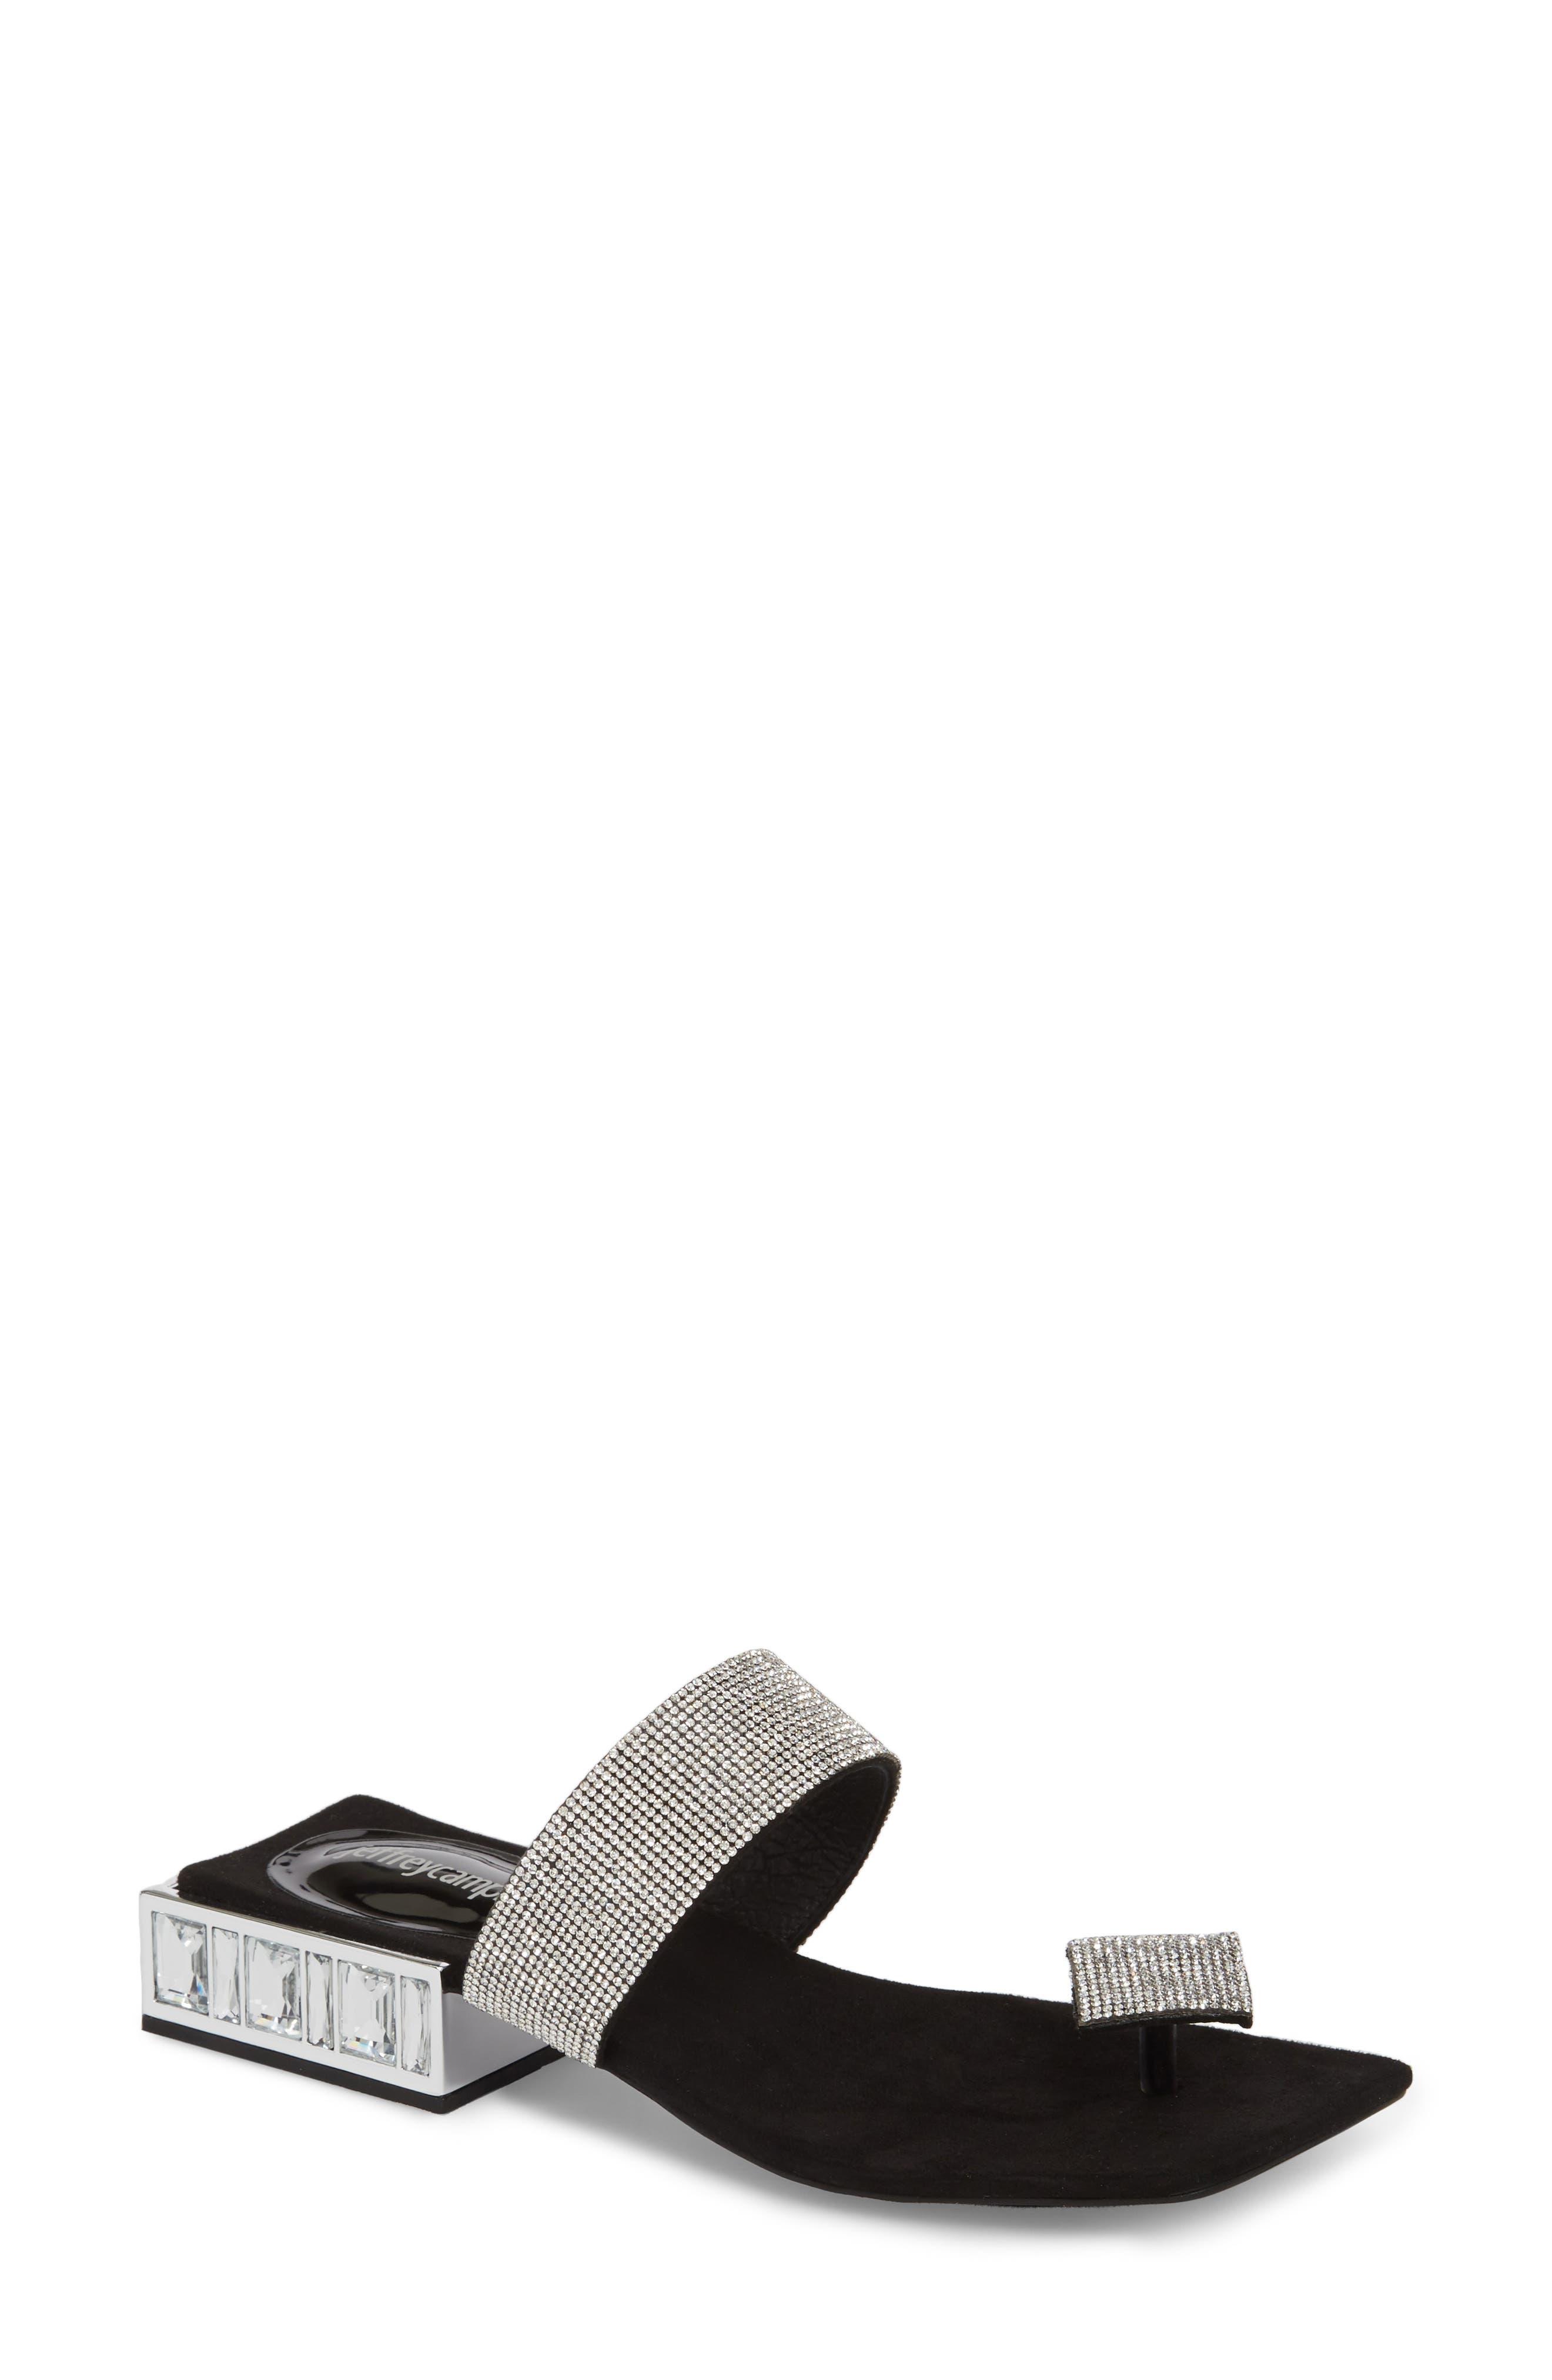 Alise Embellished Sandal,                             Main thumbnail 1, color,                             Black Suede/ Silver